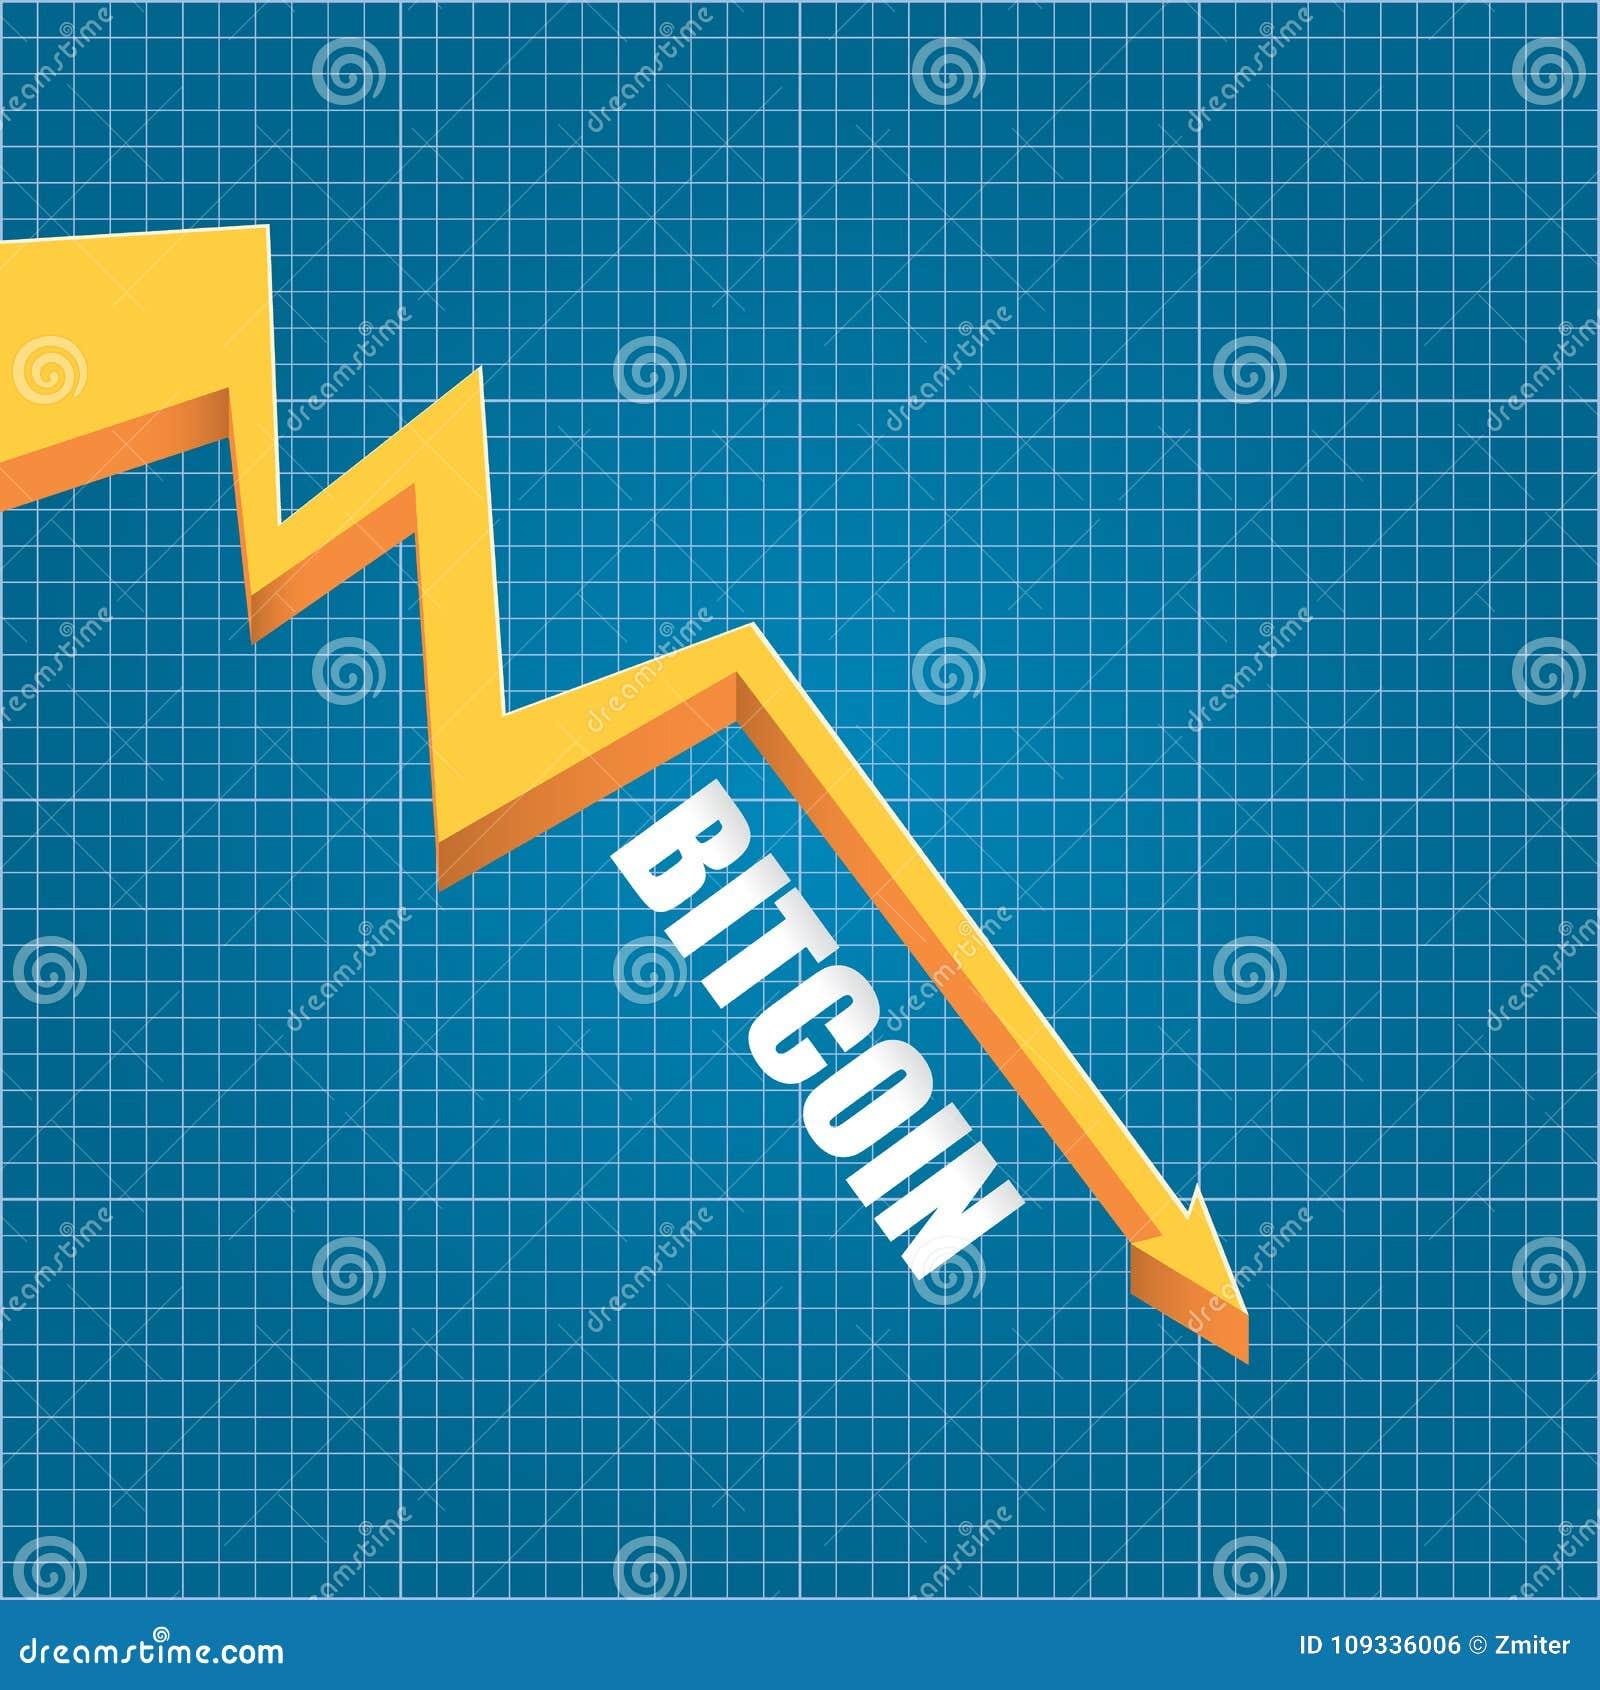 Download Vector Bitcoin Market Crash Graph On Blueprint Background. Bitcoin  Hype Concept Vector Illusrtation With